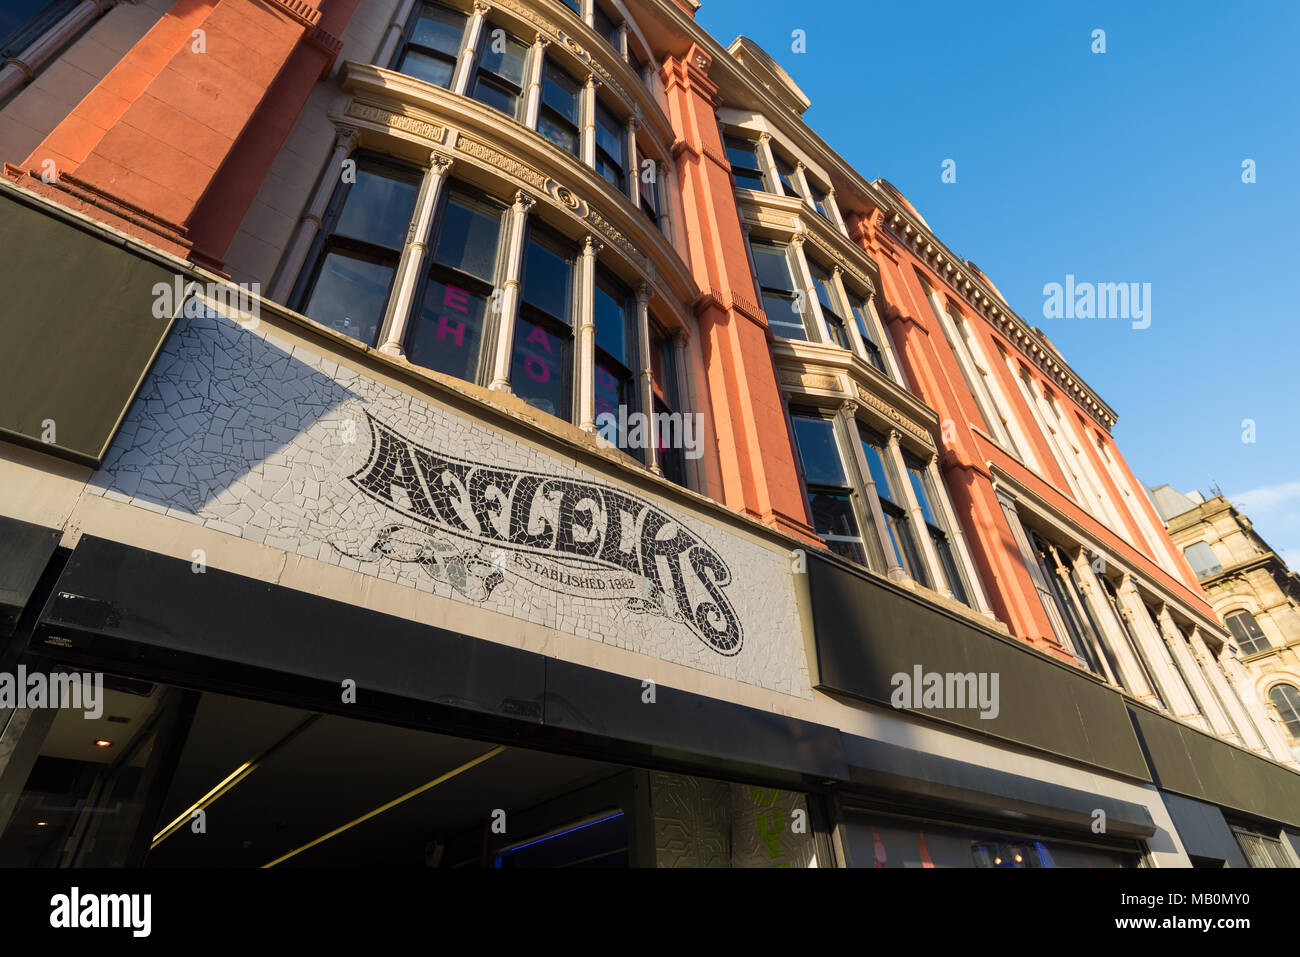 Afflecks, Oldham Street, Northern Quarter, Manchester, UK - Stock Image